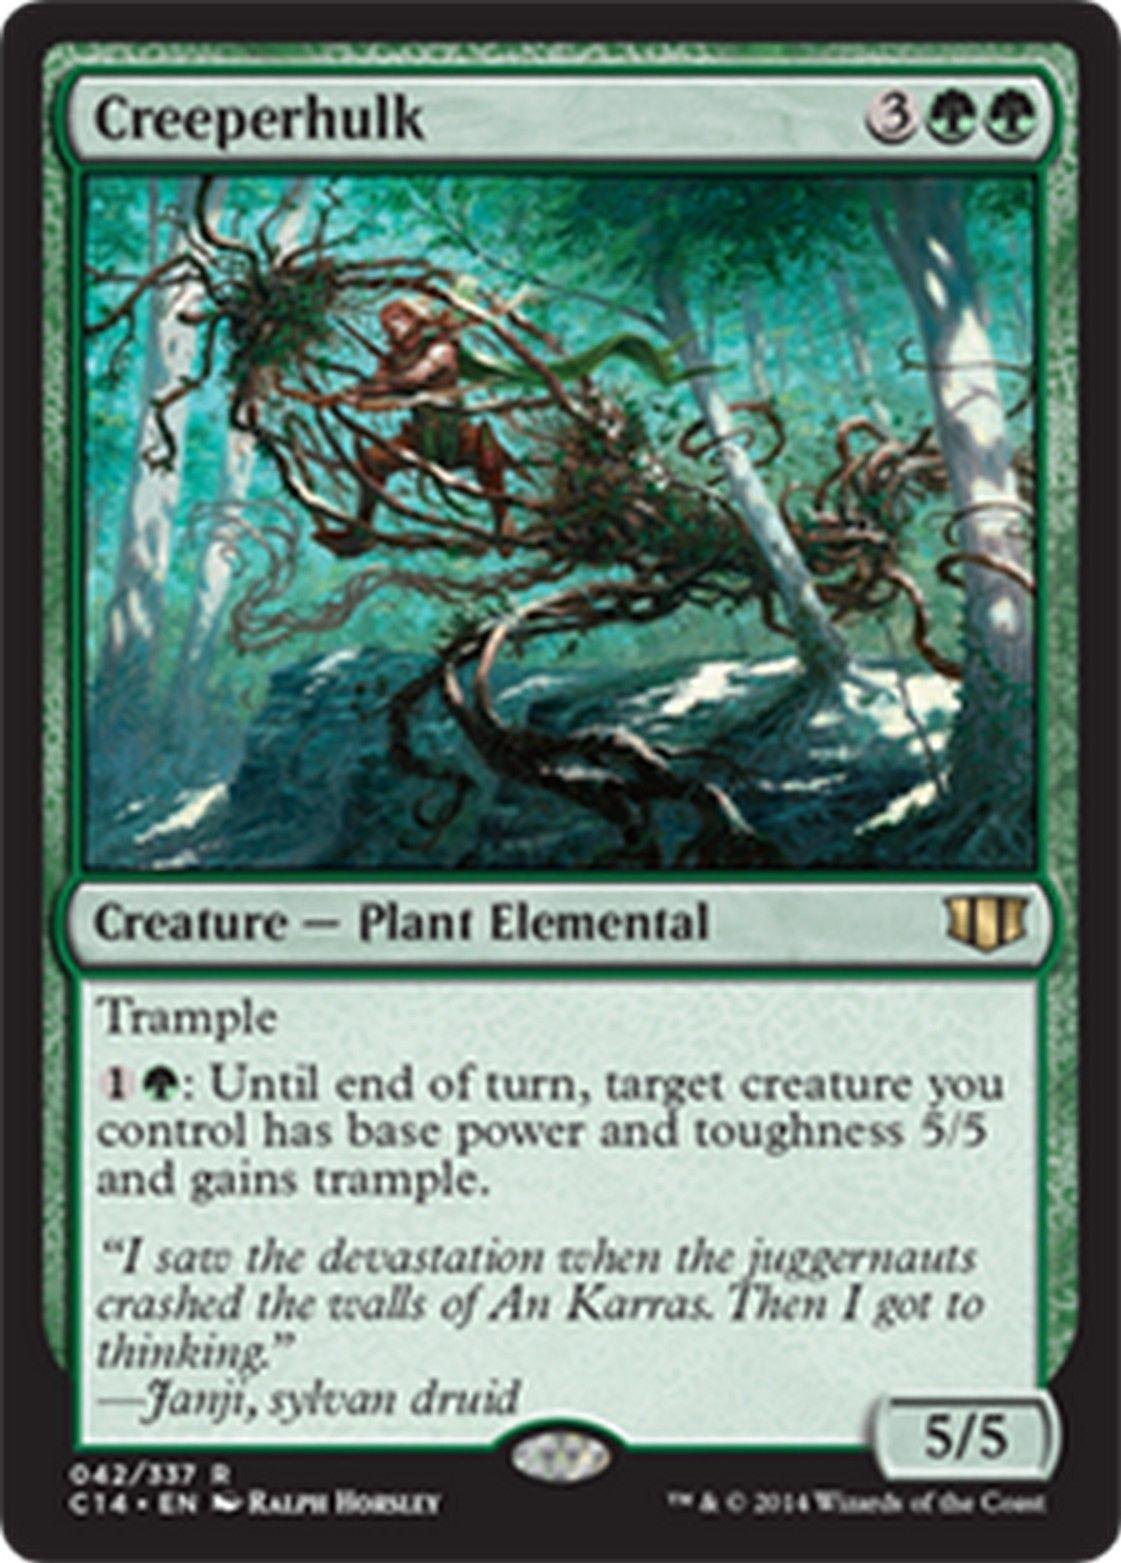 099 creeperhulk nm commander 2014 mtg magic cards